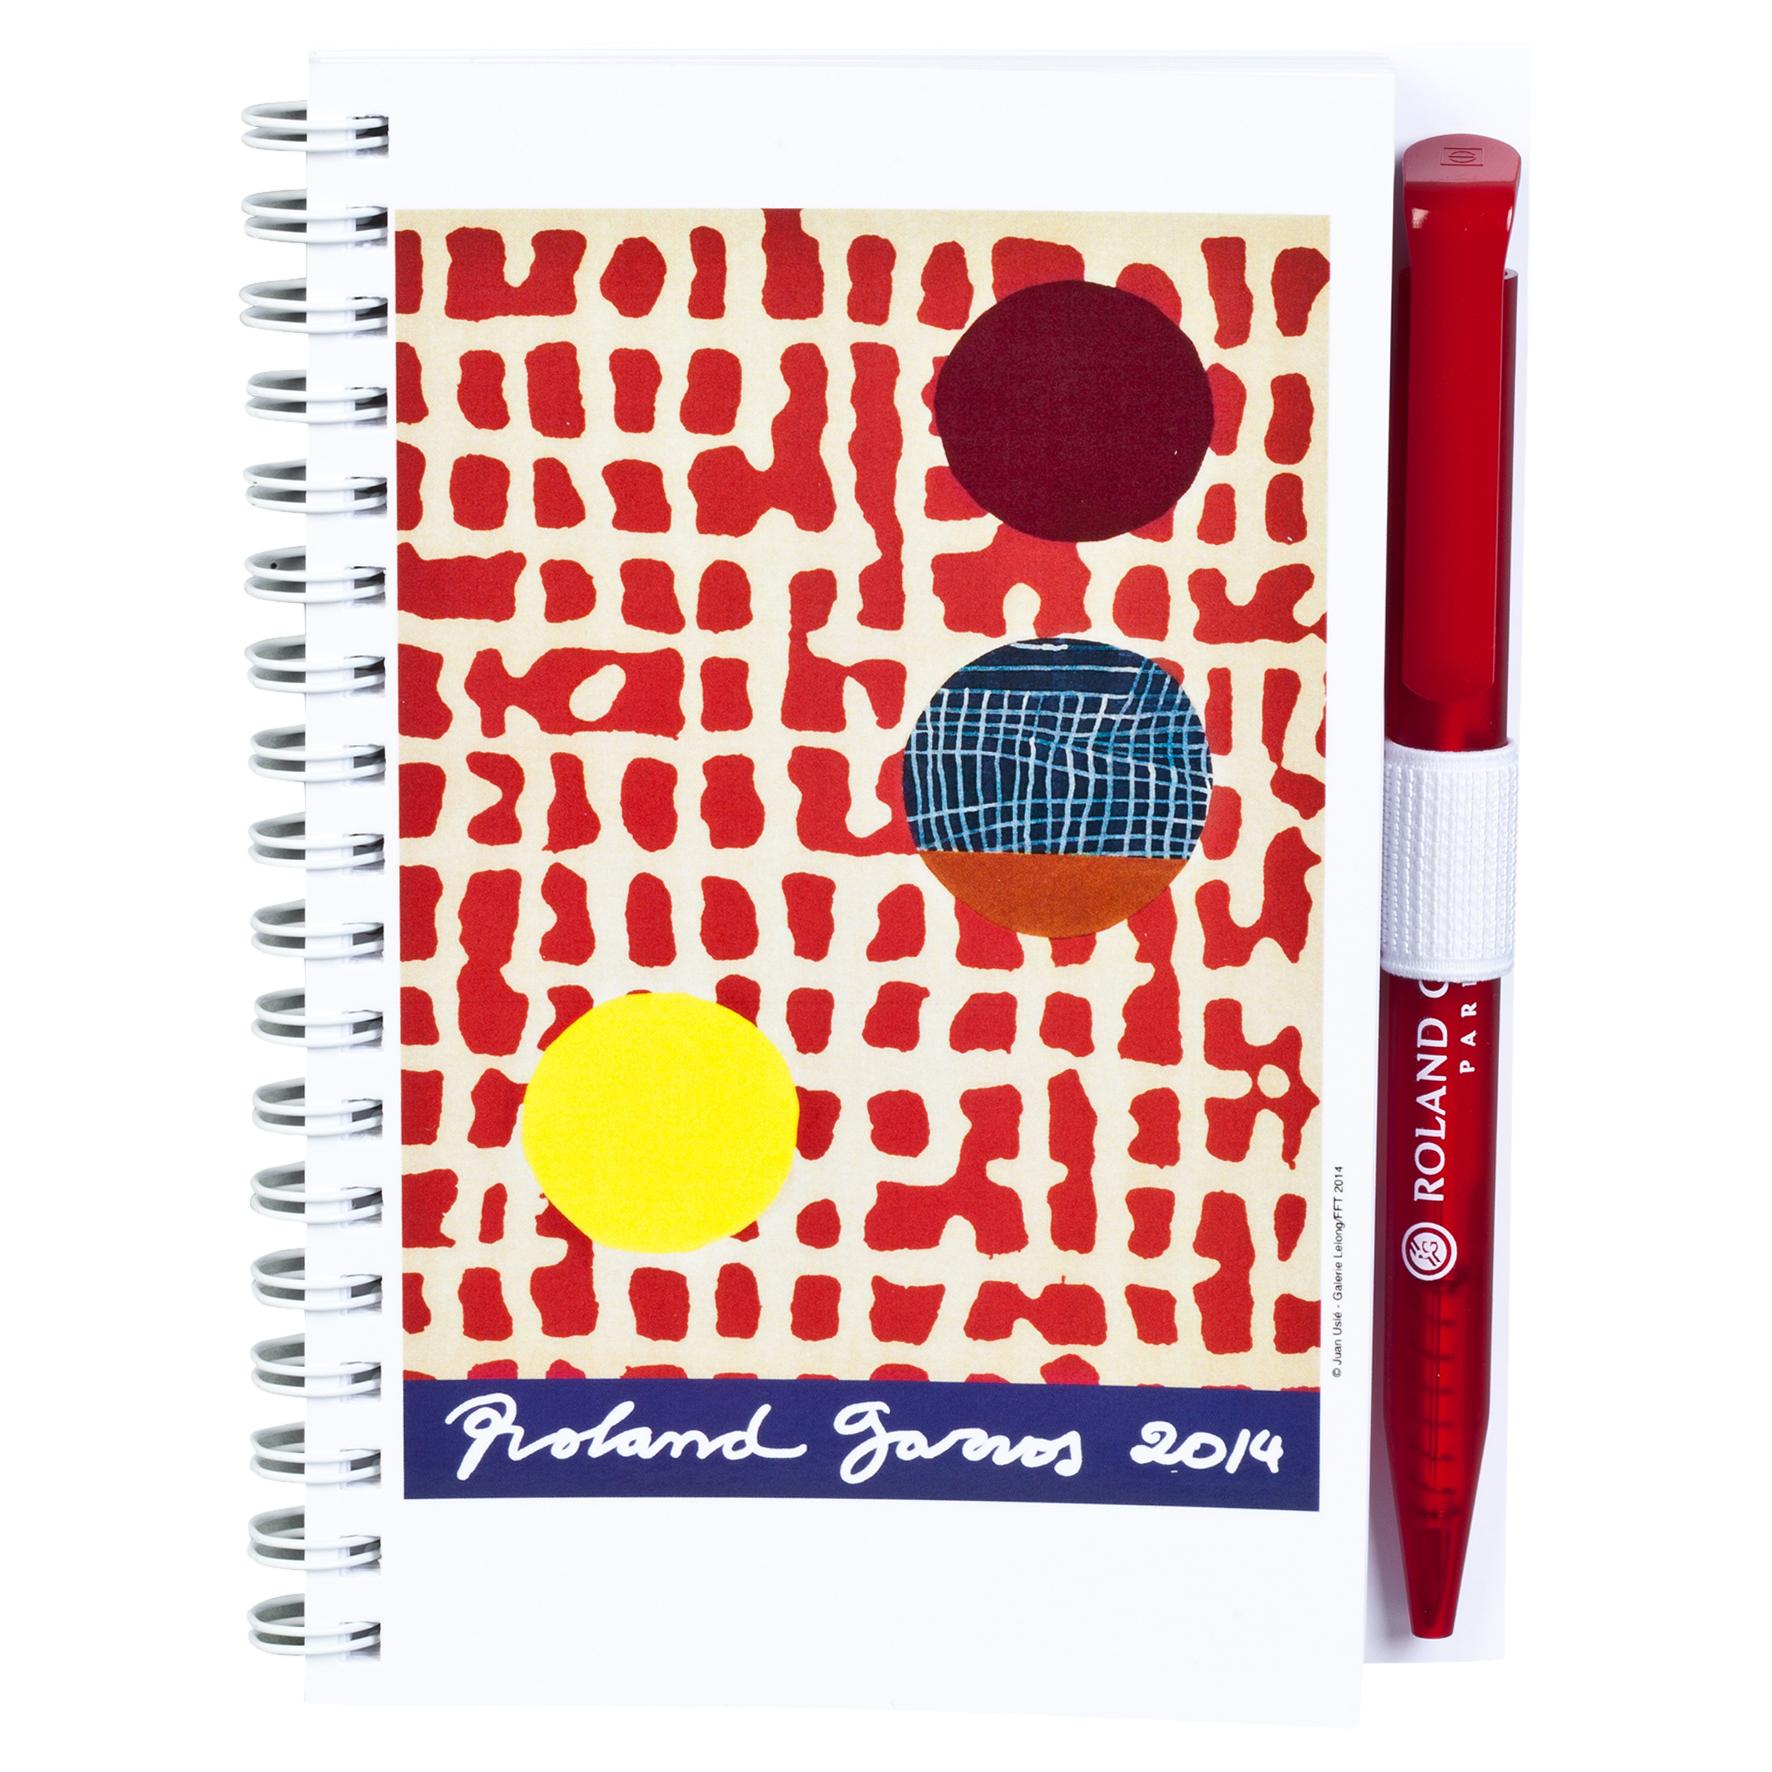 Roland-Garros Poster 2014 Notebook